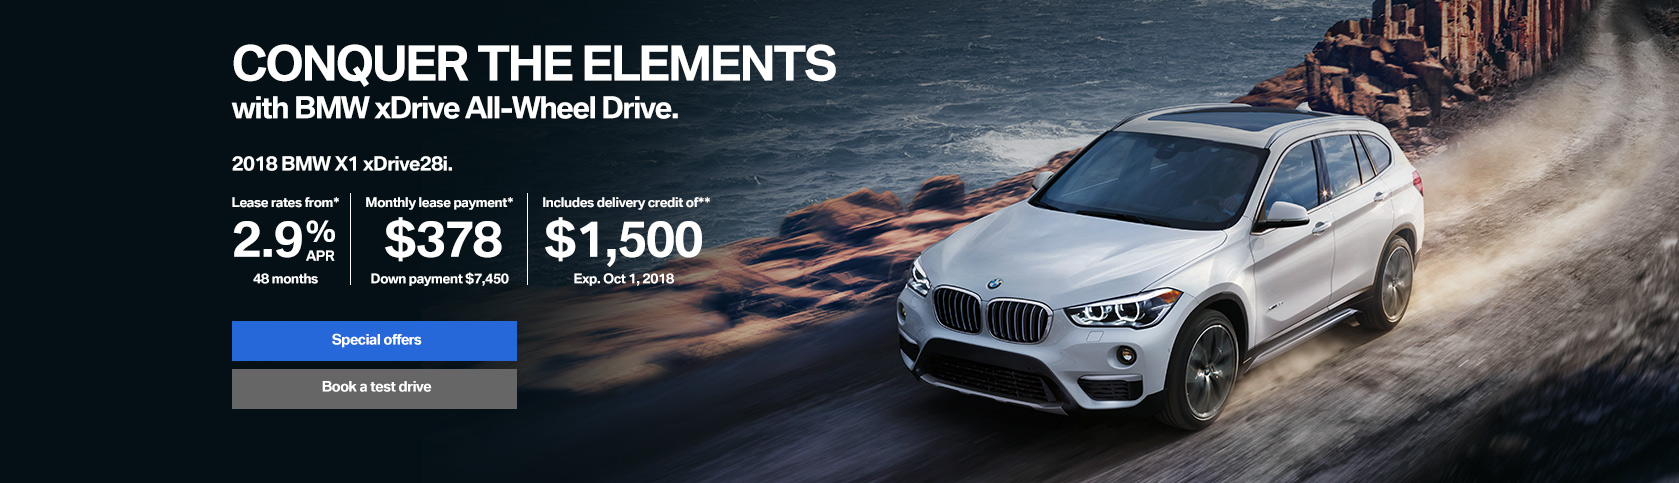 2018_BMW_SepDAG_X1_Banner_1679x483_GTA-Marnello2